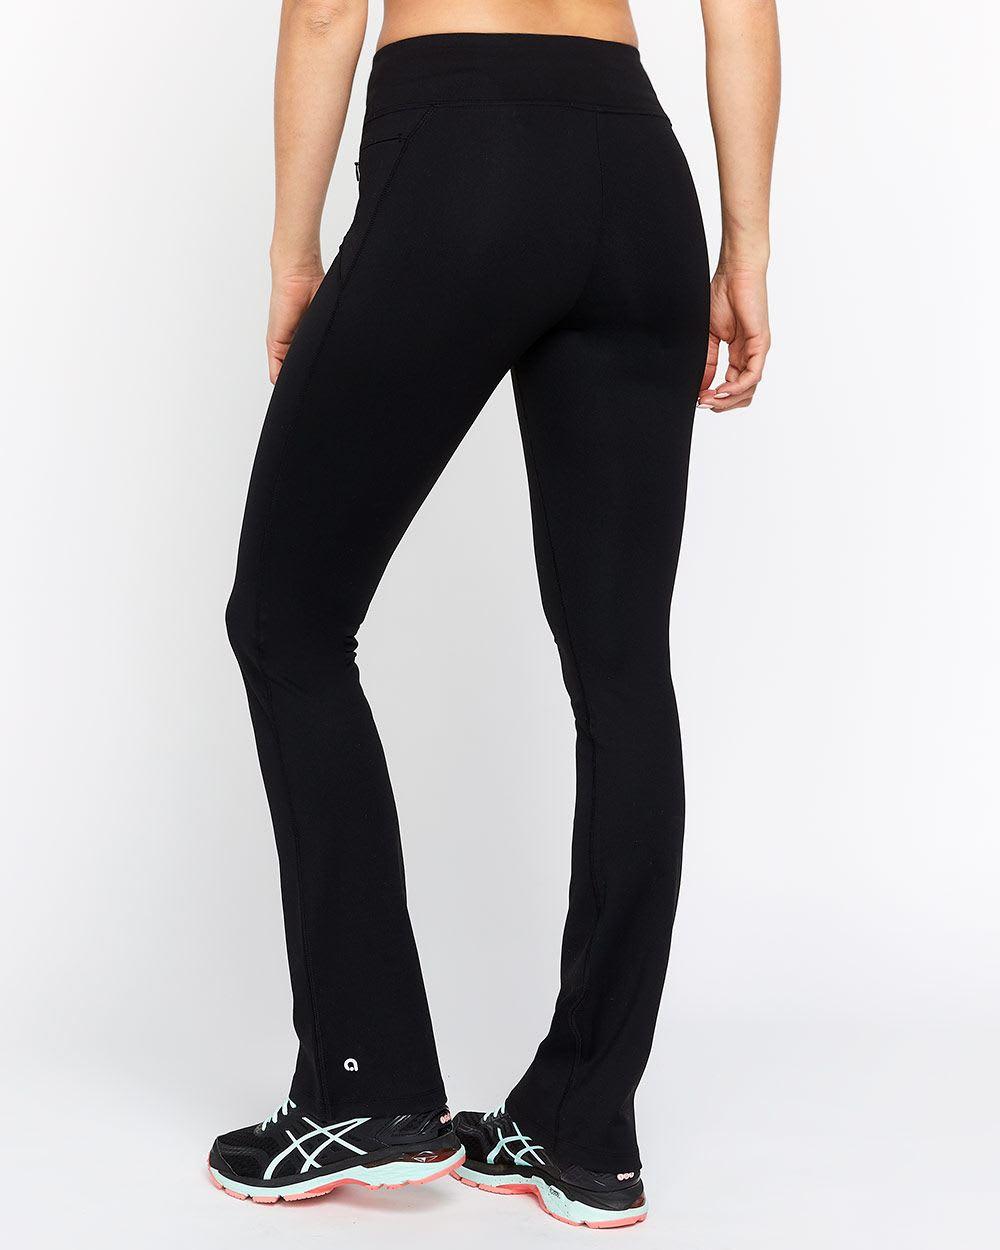 Hyba Boot Leg Urban Pants